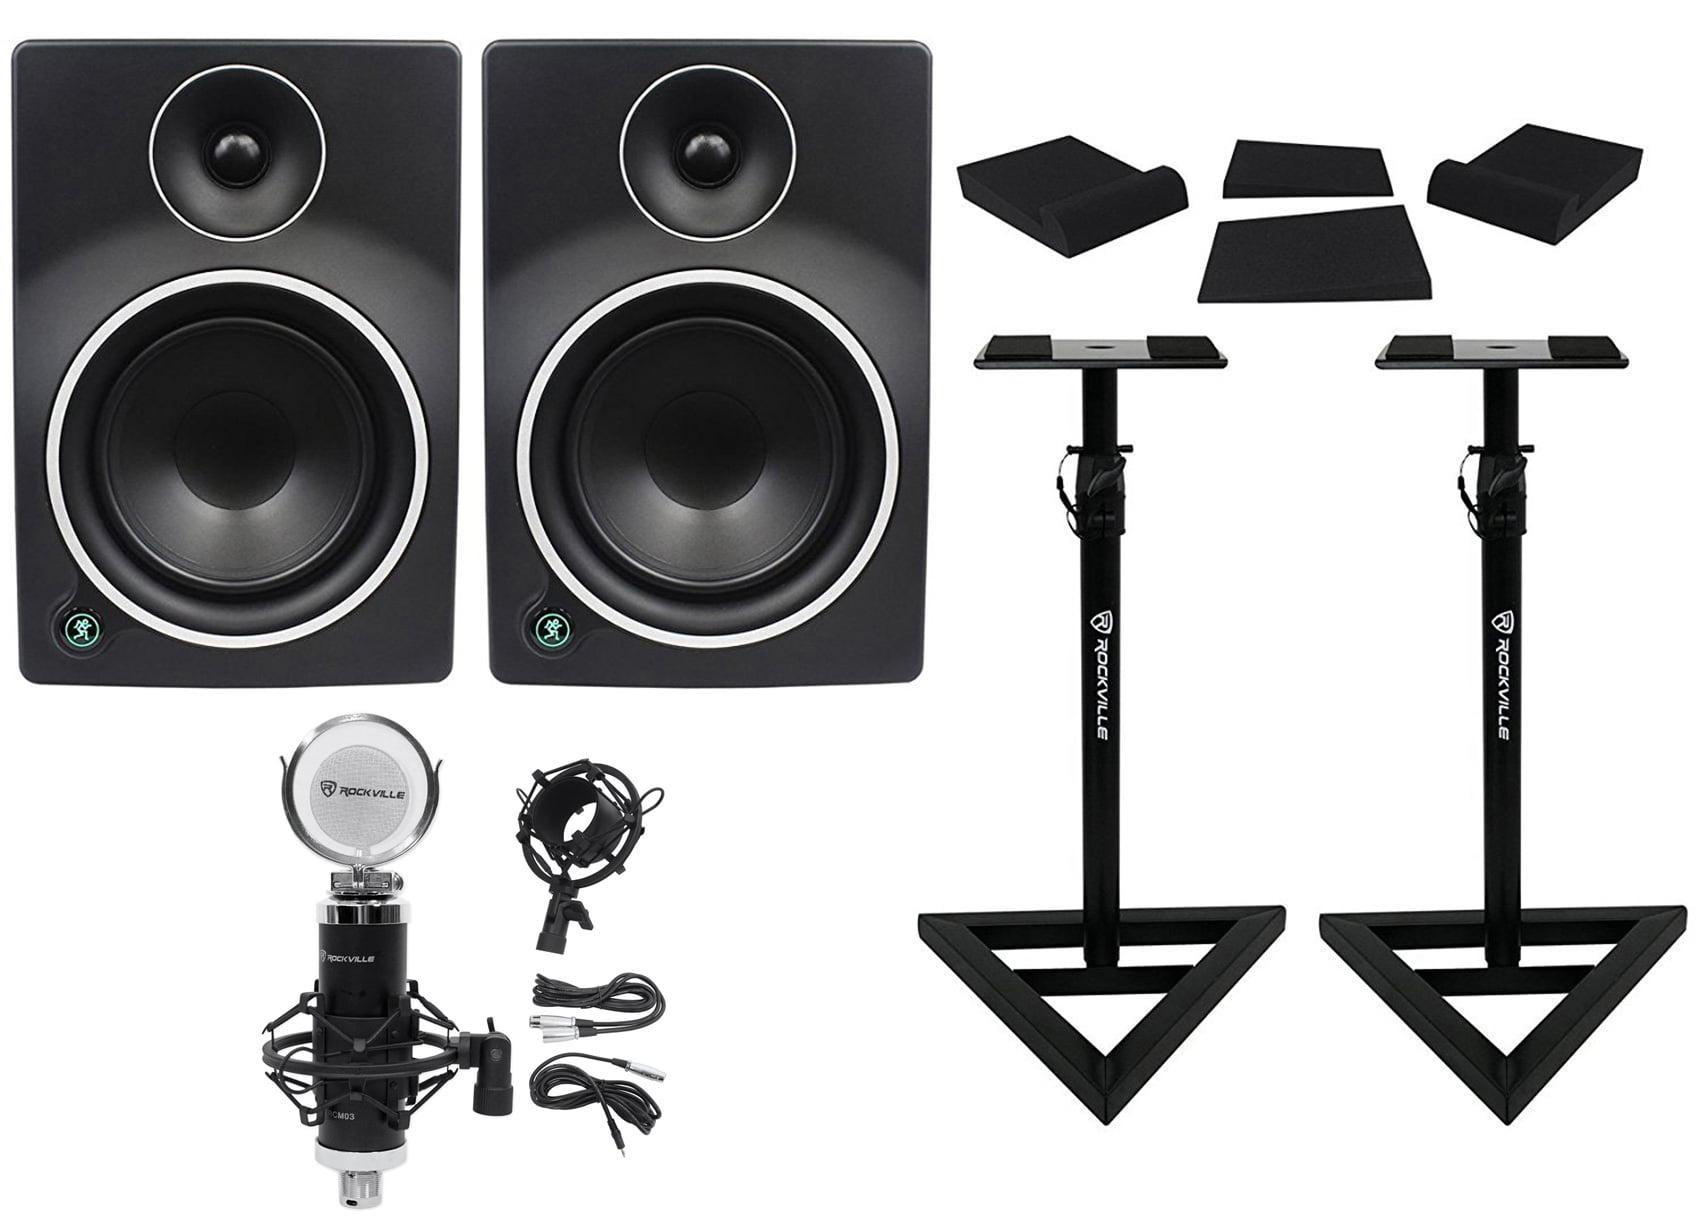 "(2) Mackie MR6mk3 6.5"" Powered Studio Monitors+Condenser Microphone+Stands+Pads by Mackie"